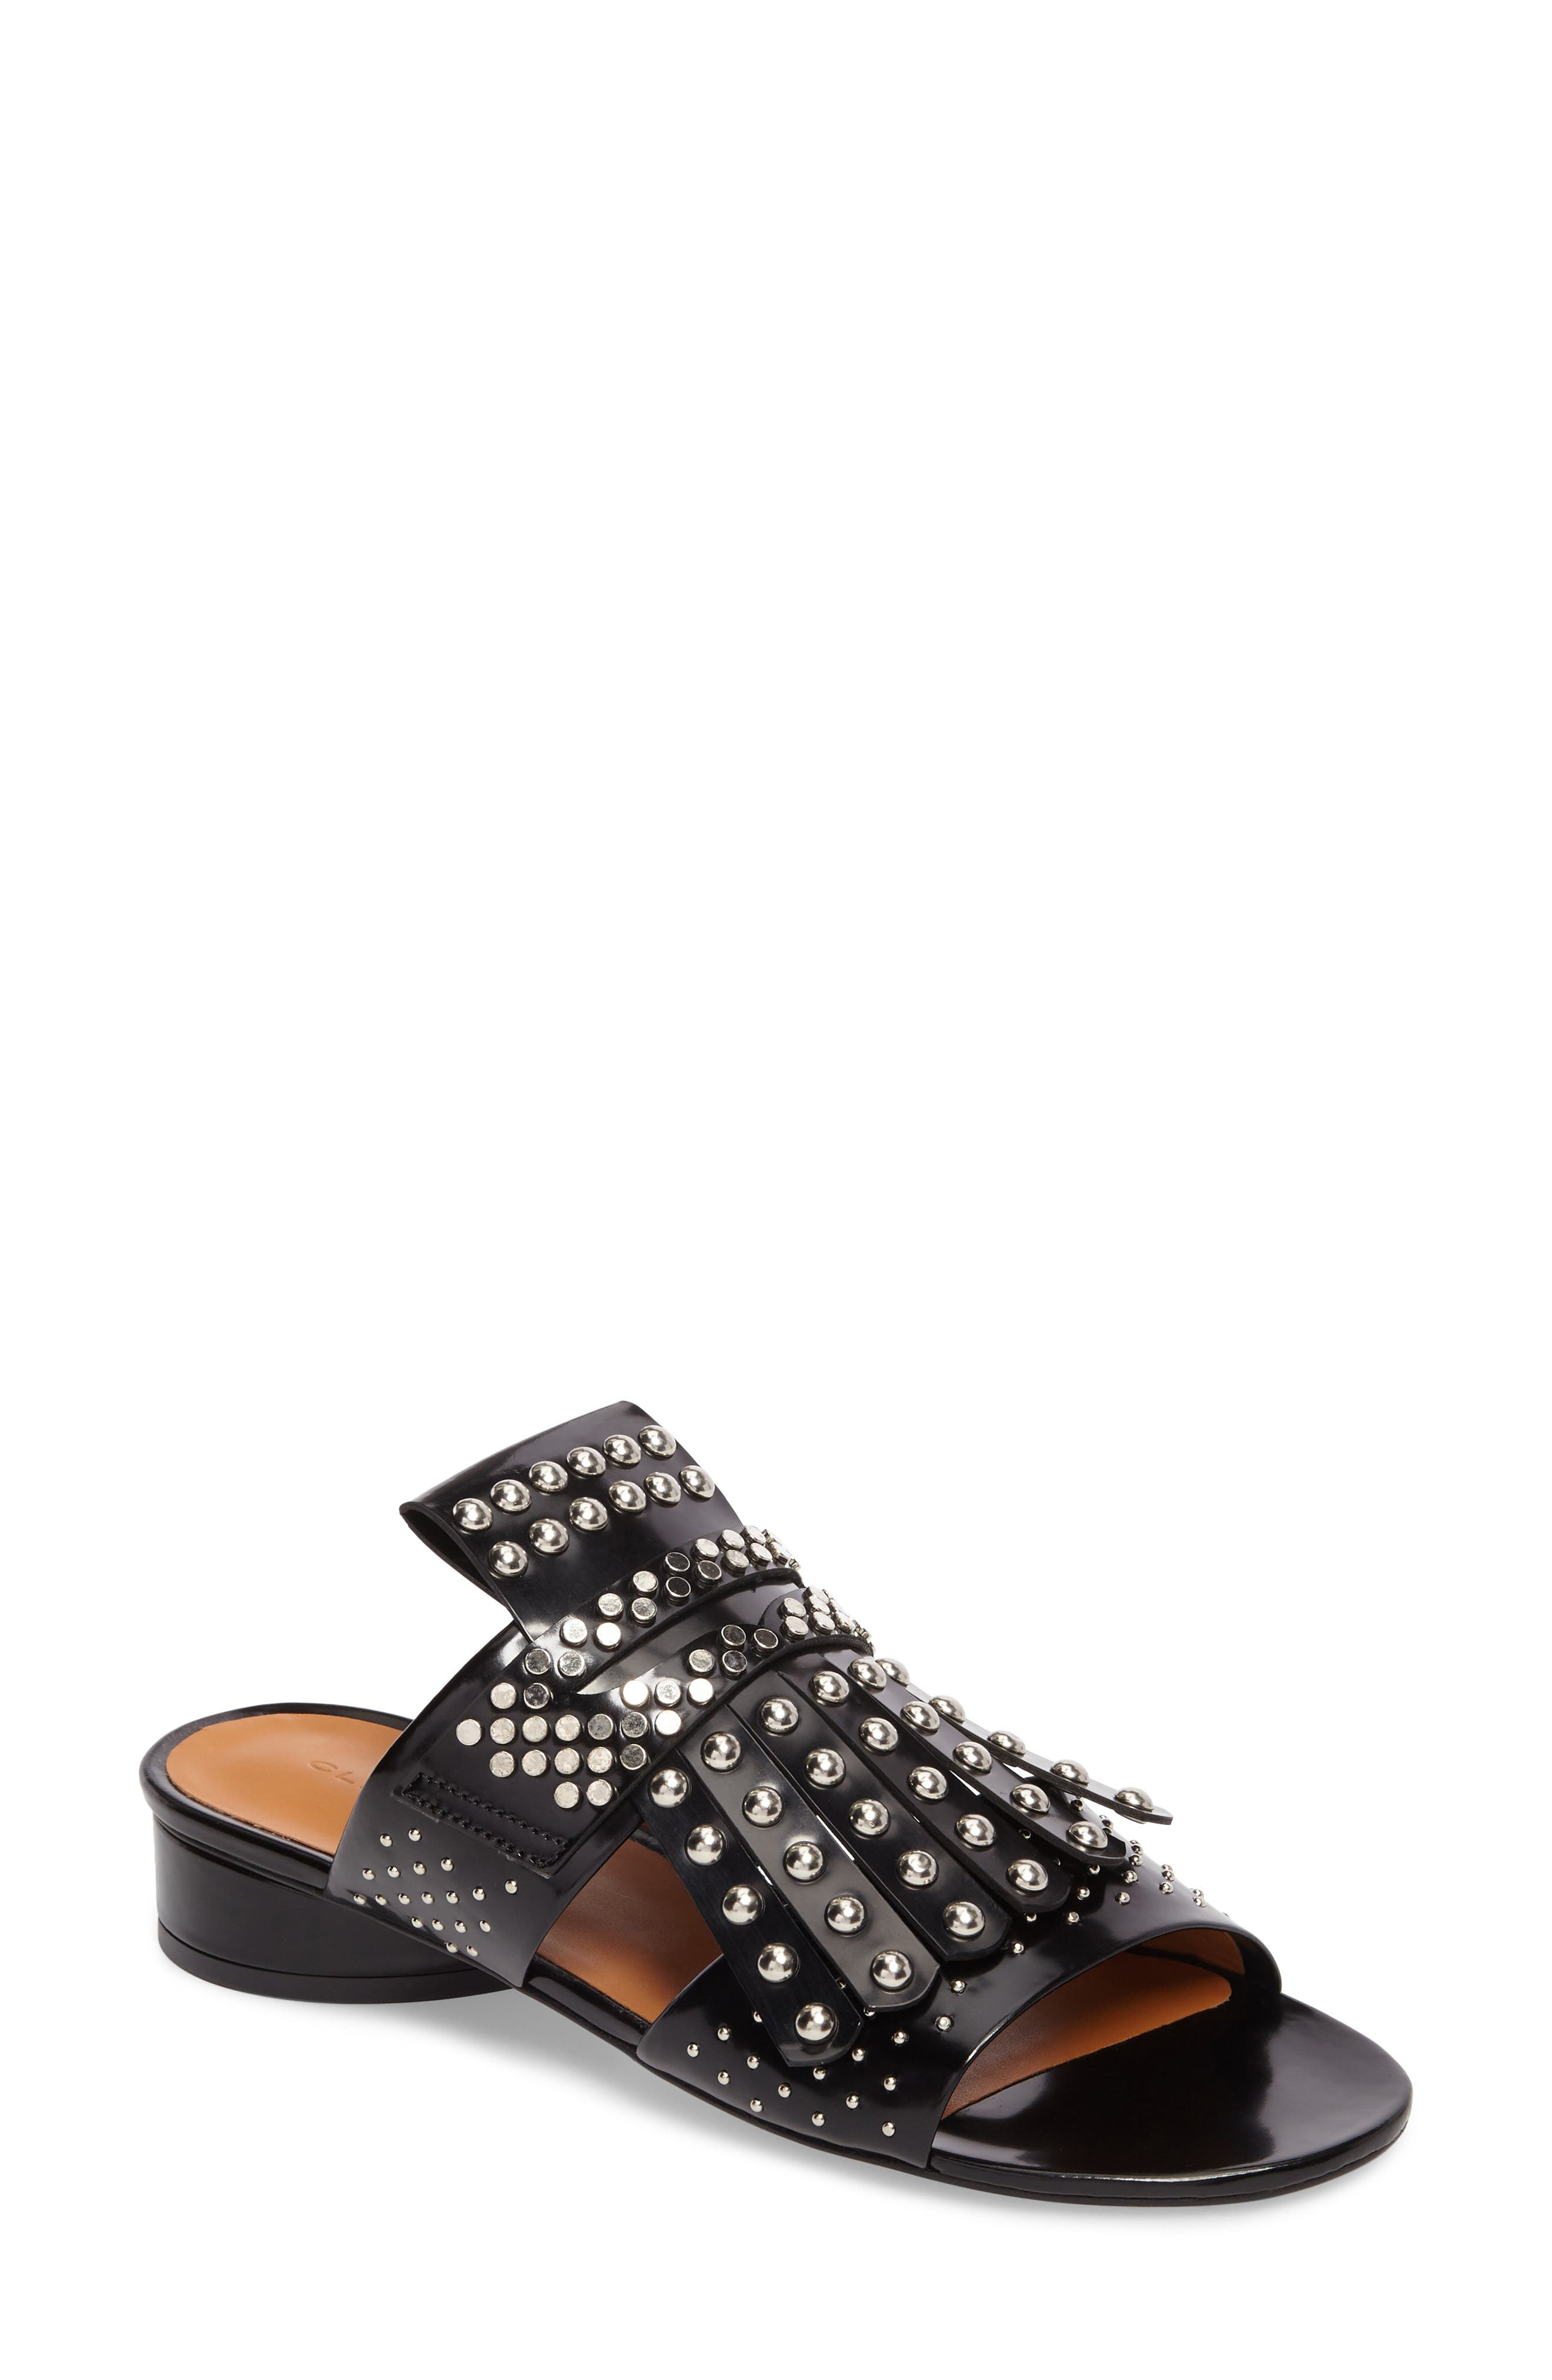 Main Image - Robert Clergerie Figlouc Studded Sandal (Women)